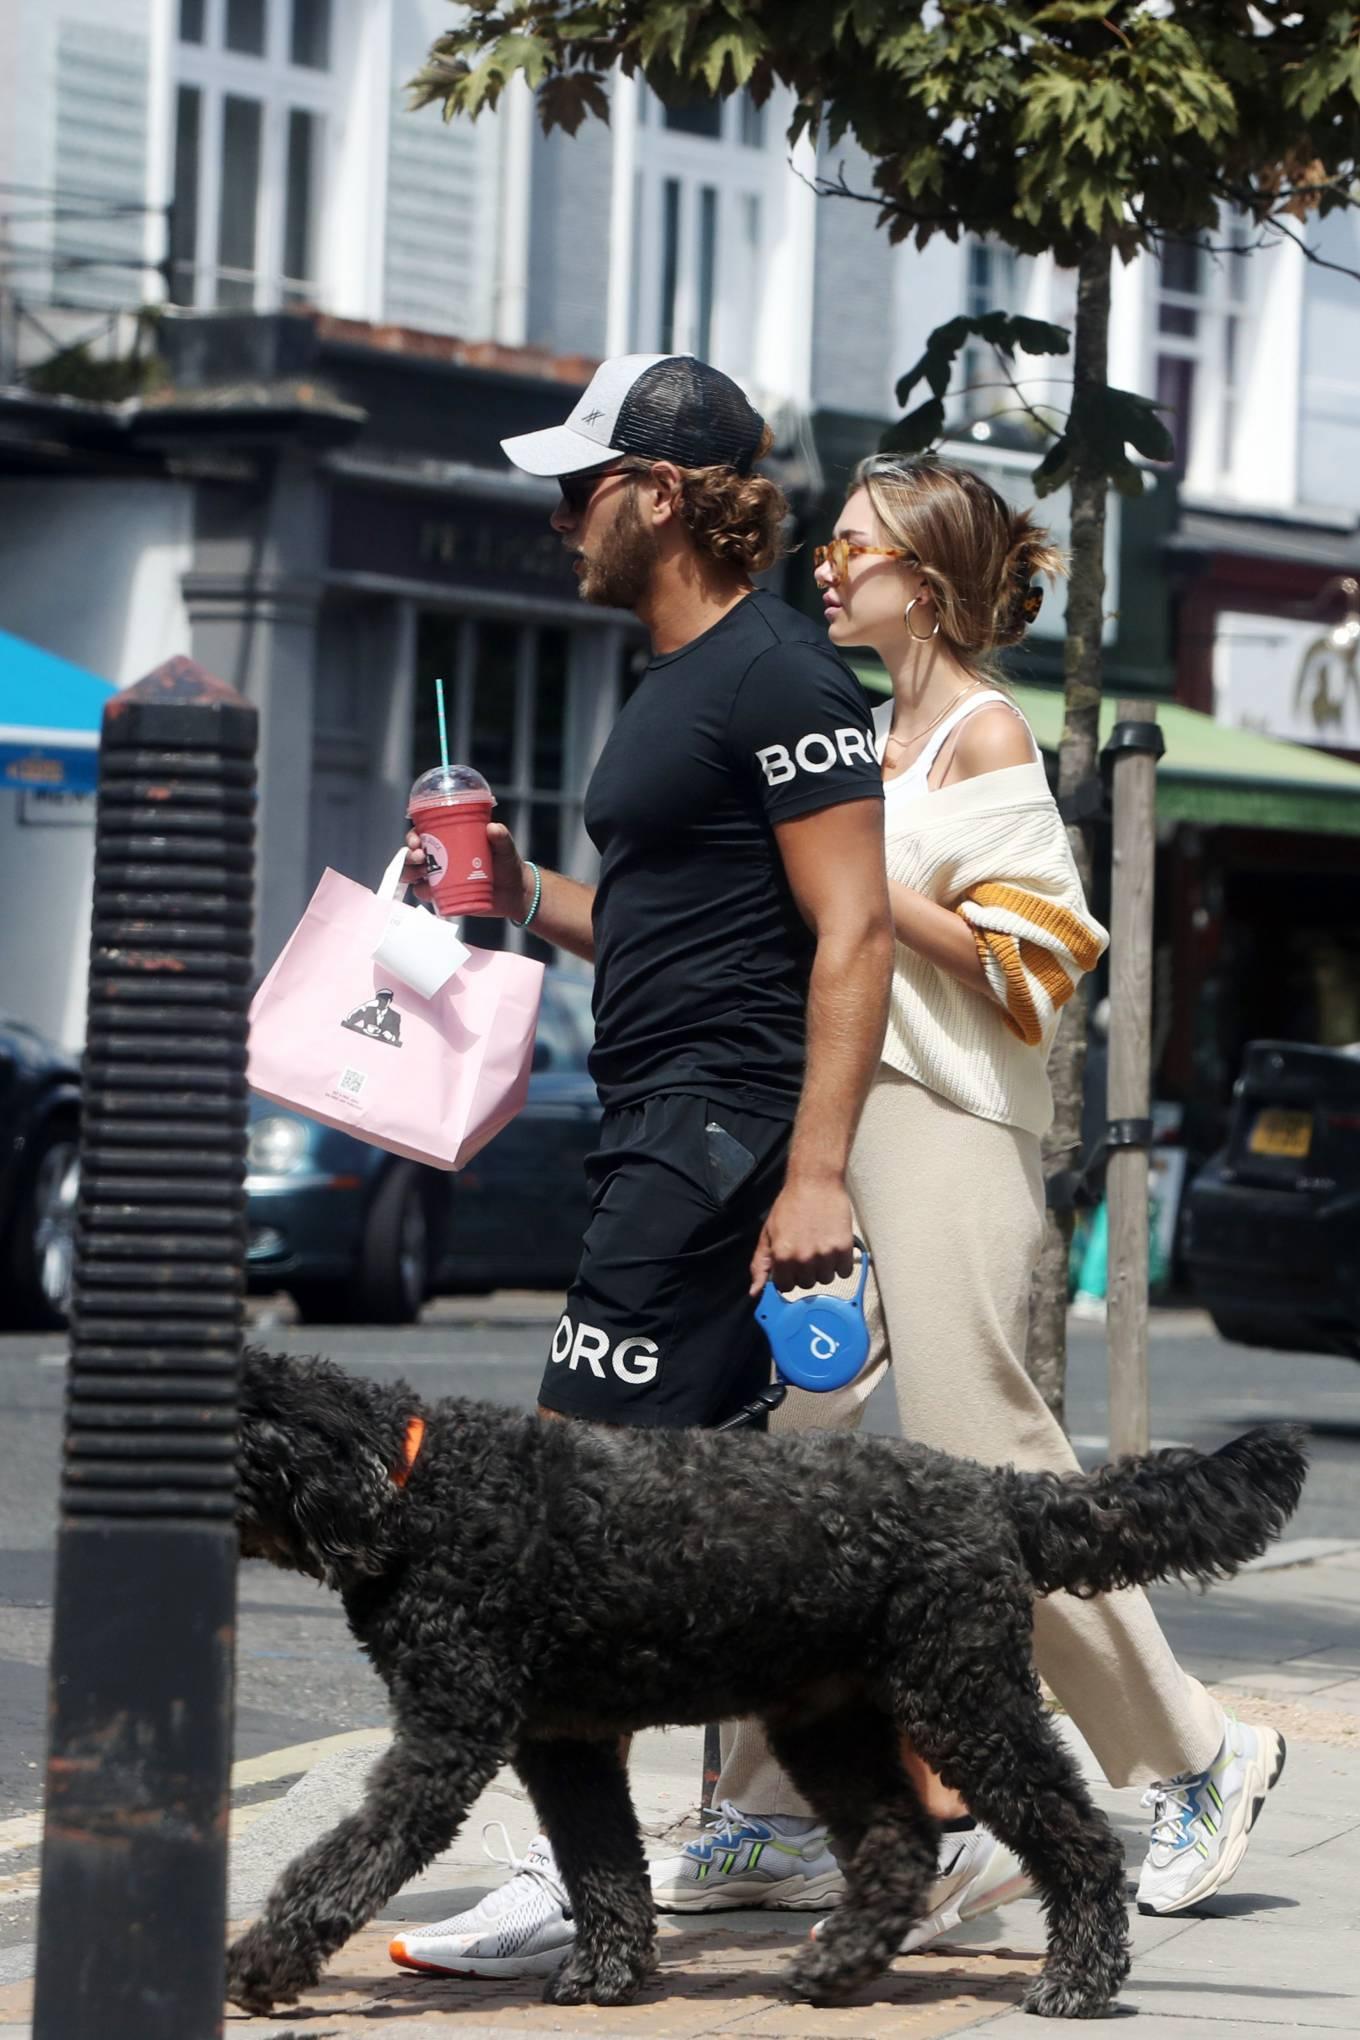 Delilah Belle Hamlin 2020 : Eyal Booker and Delilah Belle Hamlin – Out in London-07